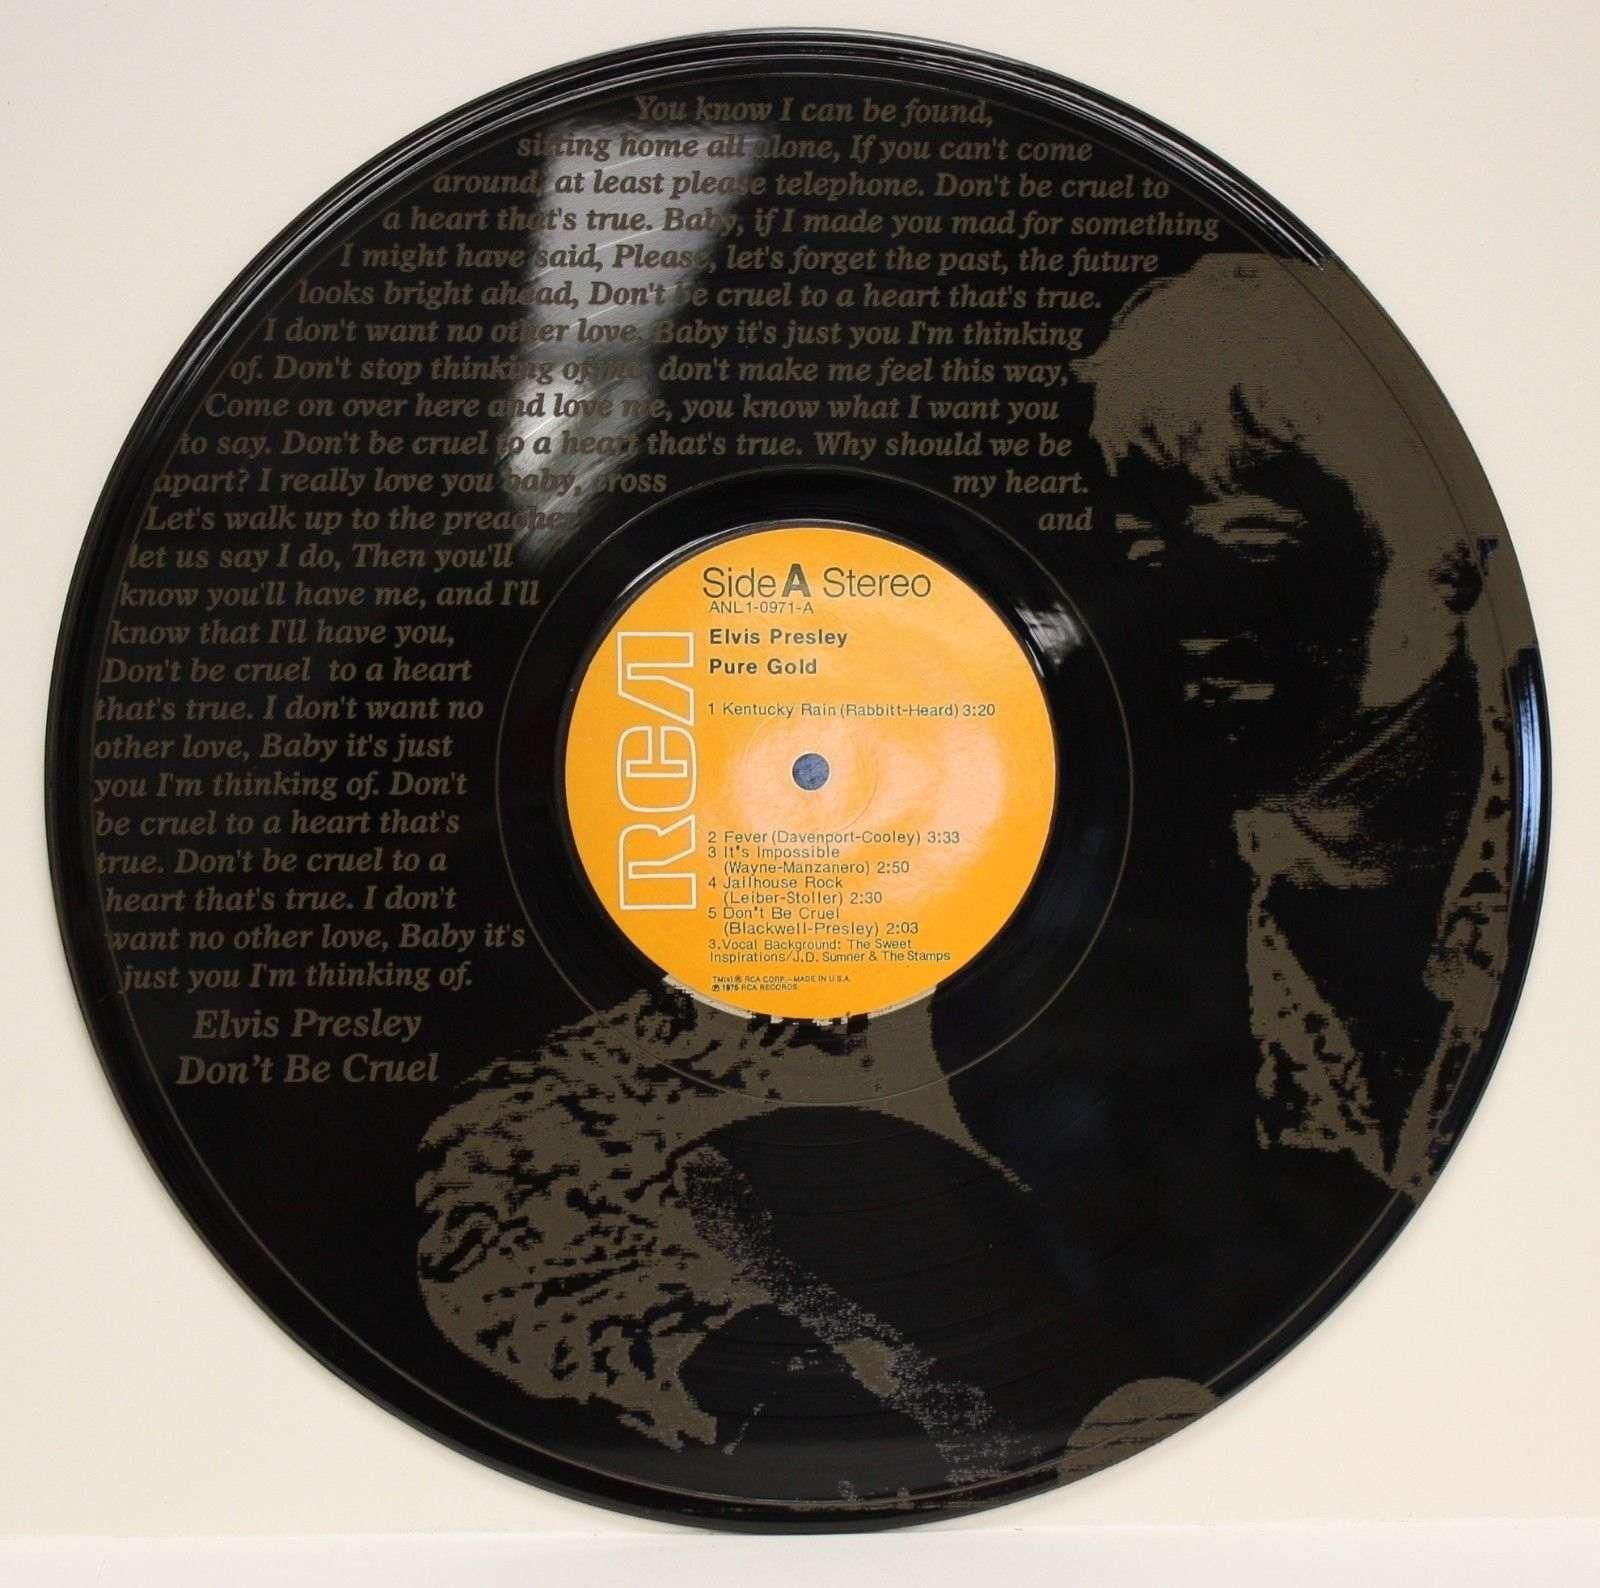 Elvis Presley Vinyl Lp Etched W Dont Be Cruel Lyrics Ltd